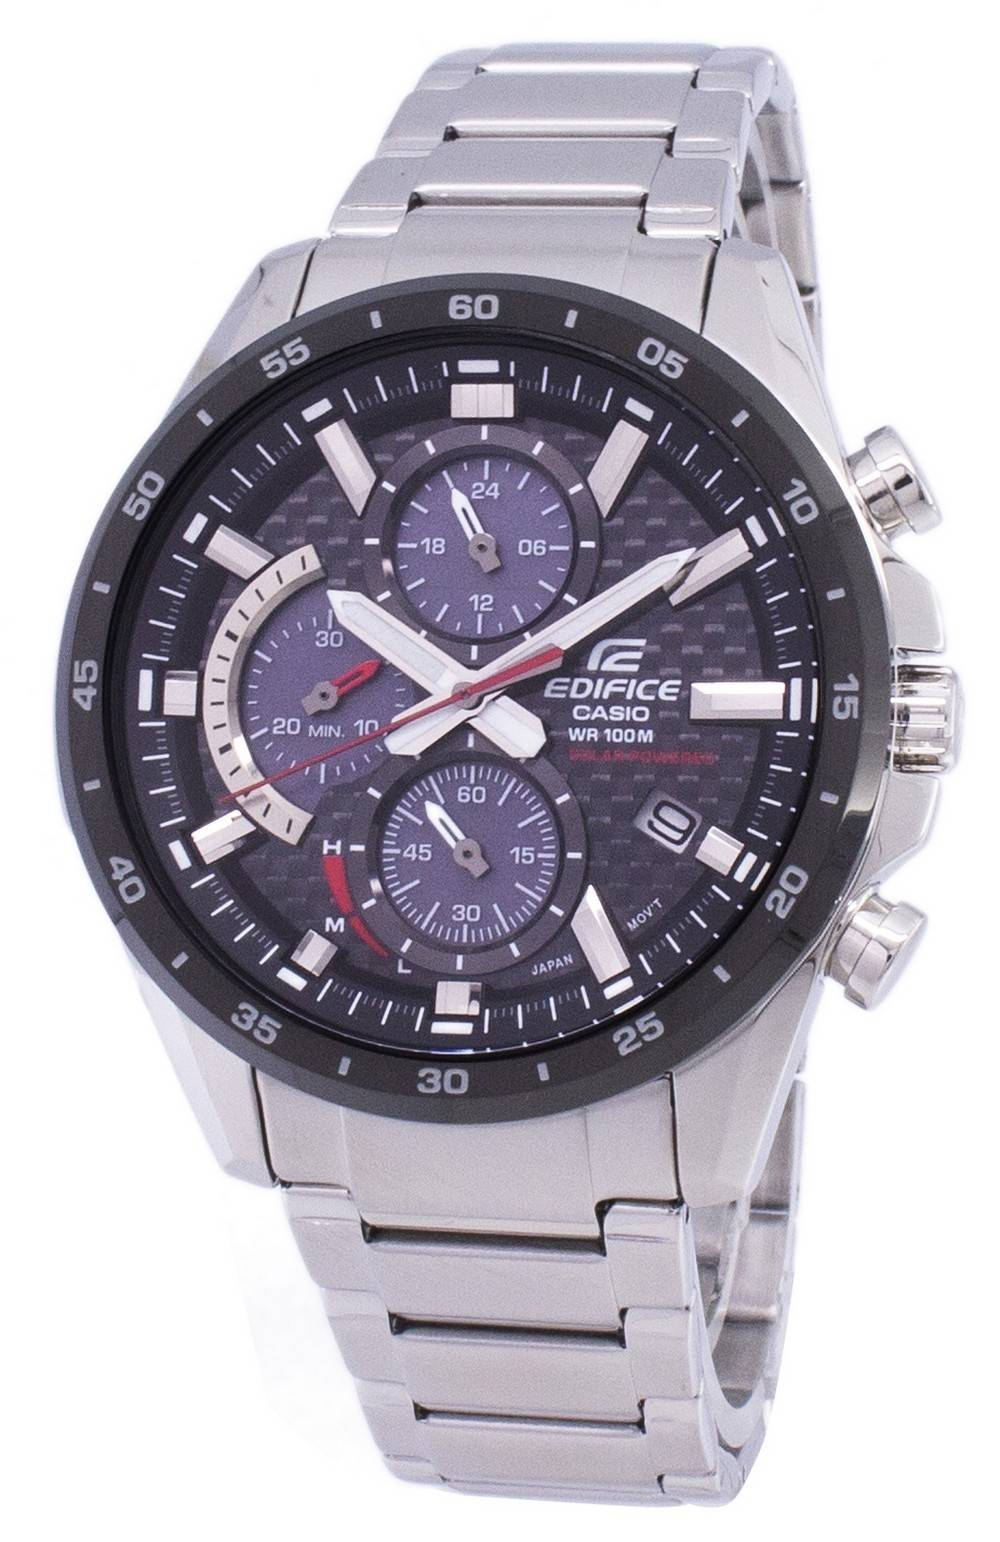 a638336c0abf Detalhes sobre Casio Edifice Chronograph Solar EQS900DB-1AV EQS-900DB-1AV  Mens Watch